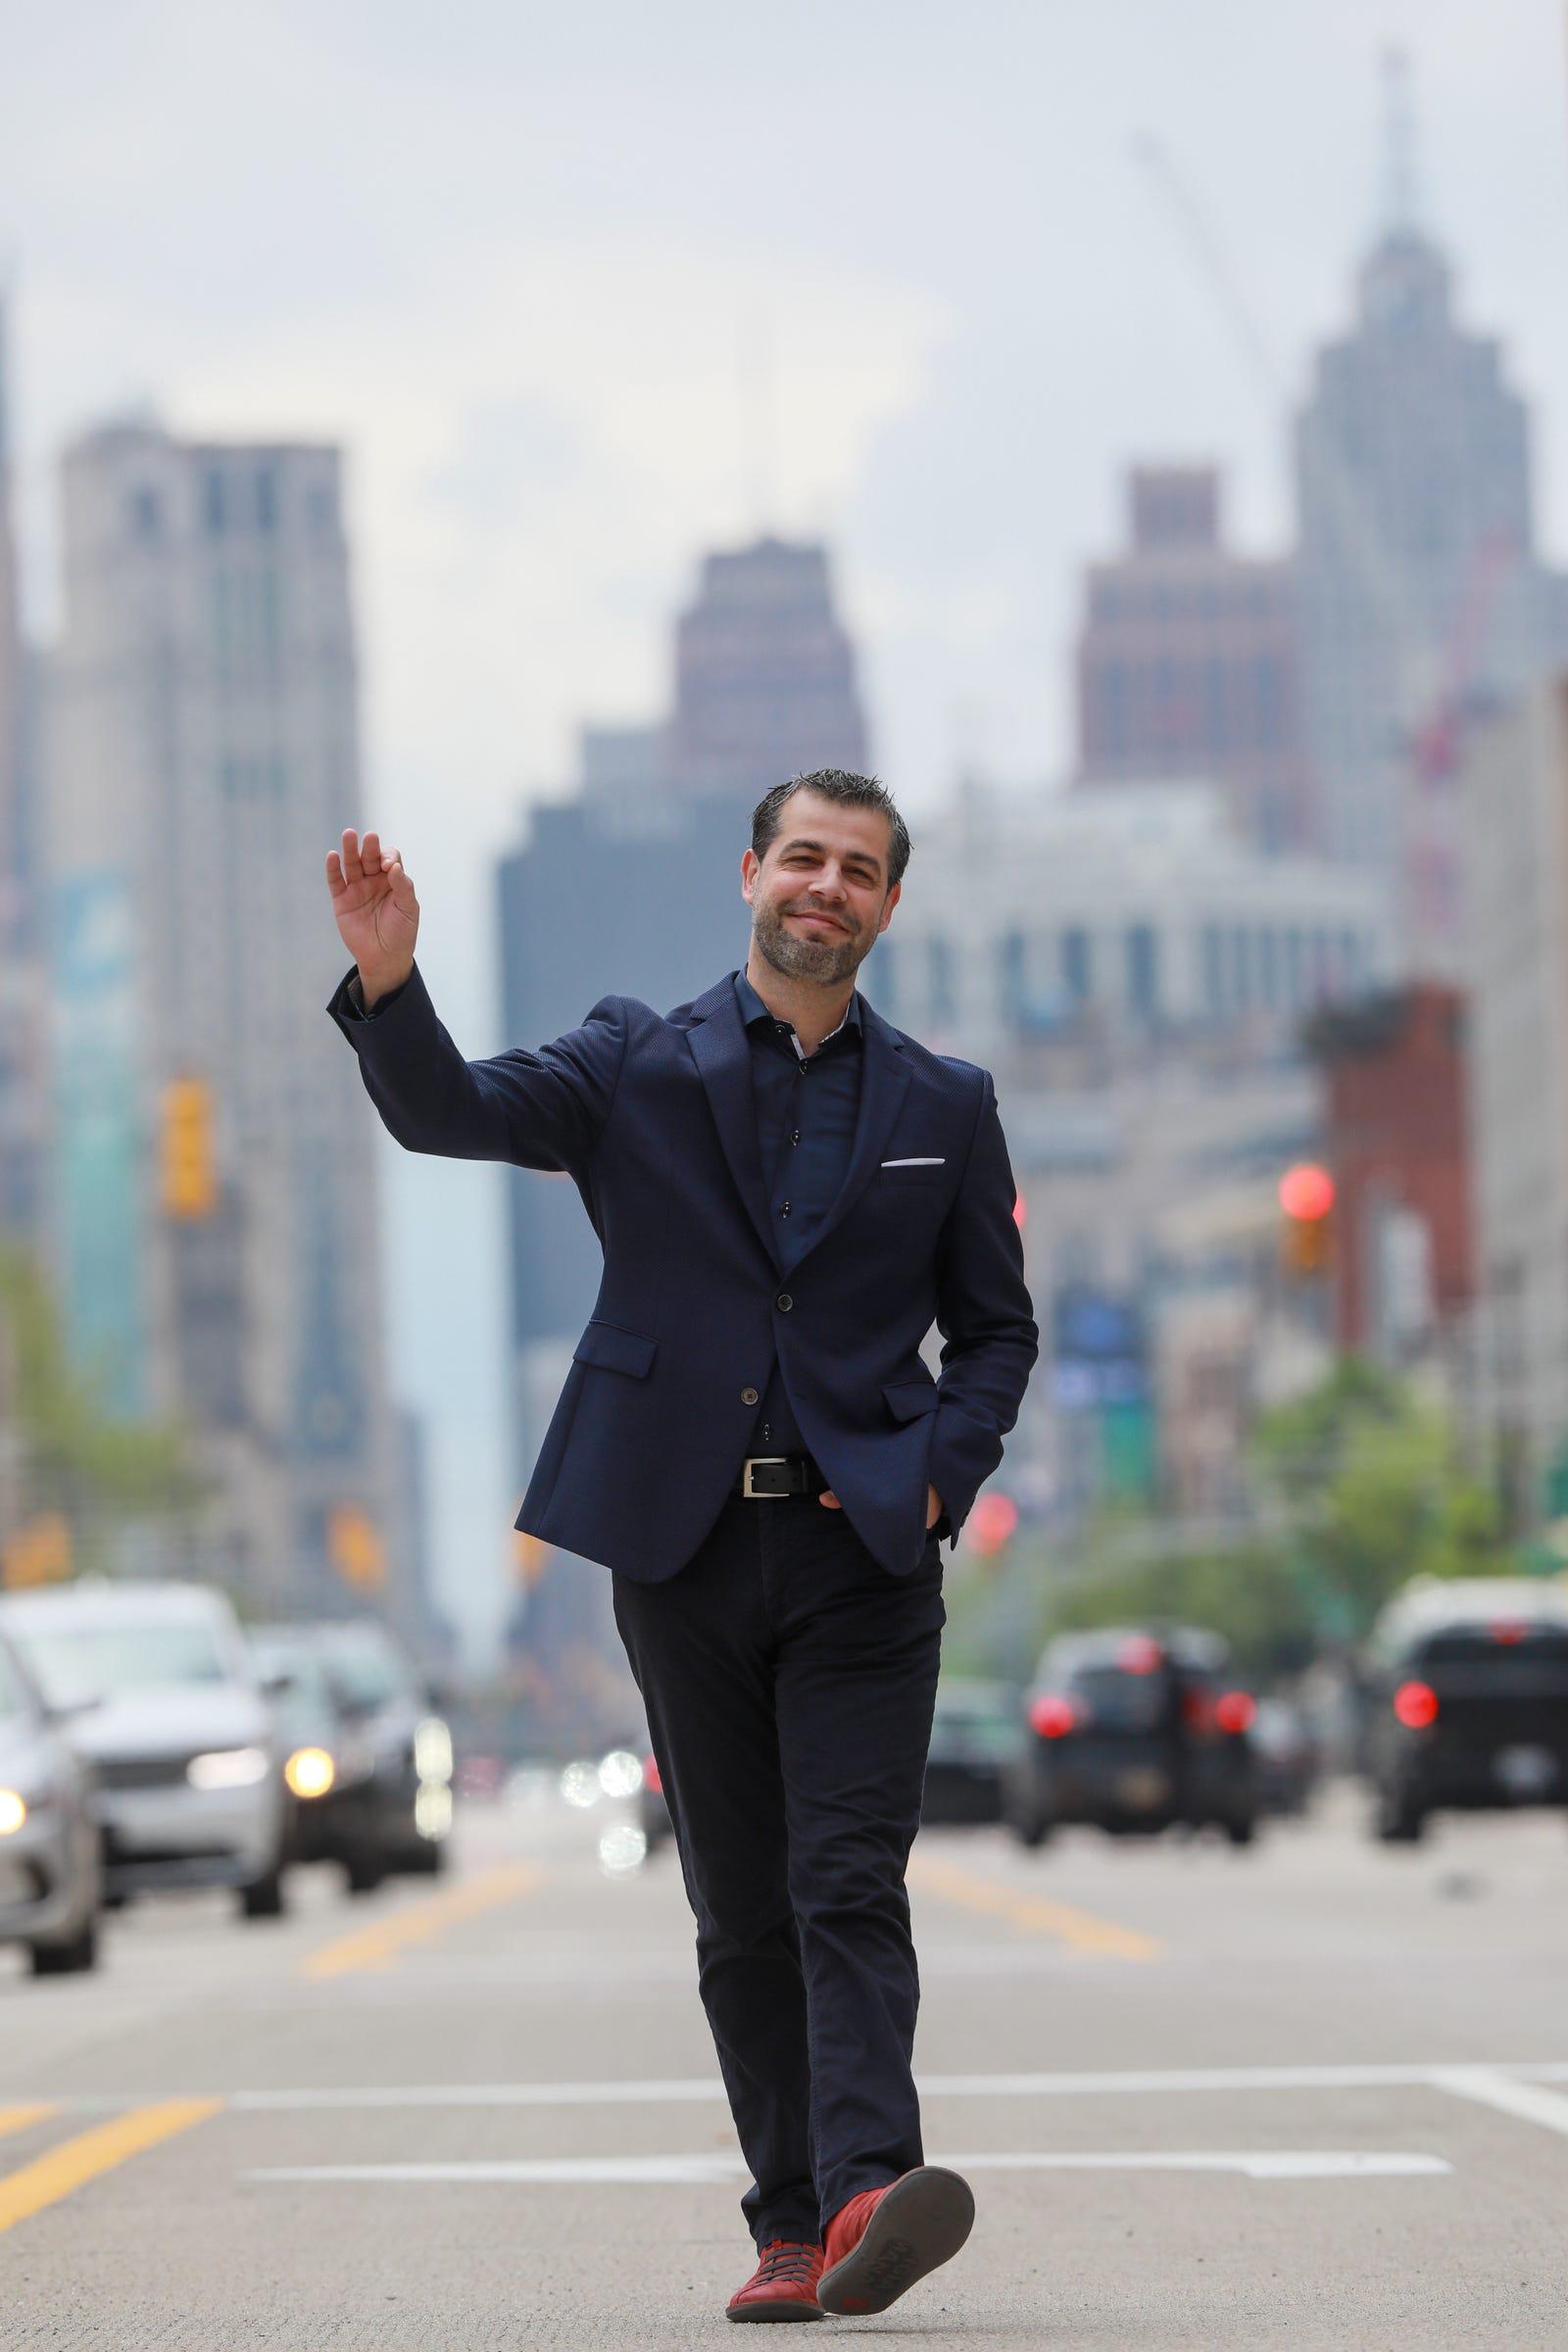 DSO s Jader Bignamini led through the pandemic — now he s ready to make mark on Detroit